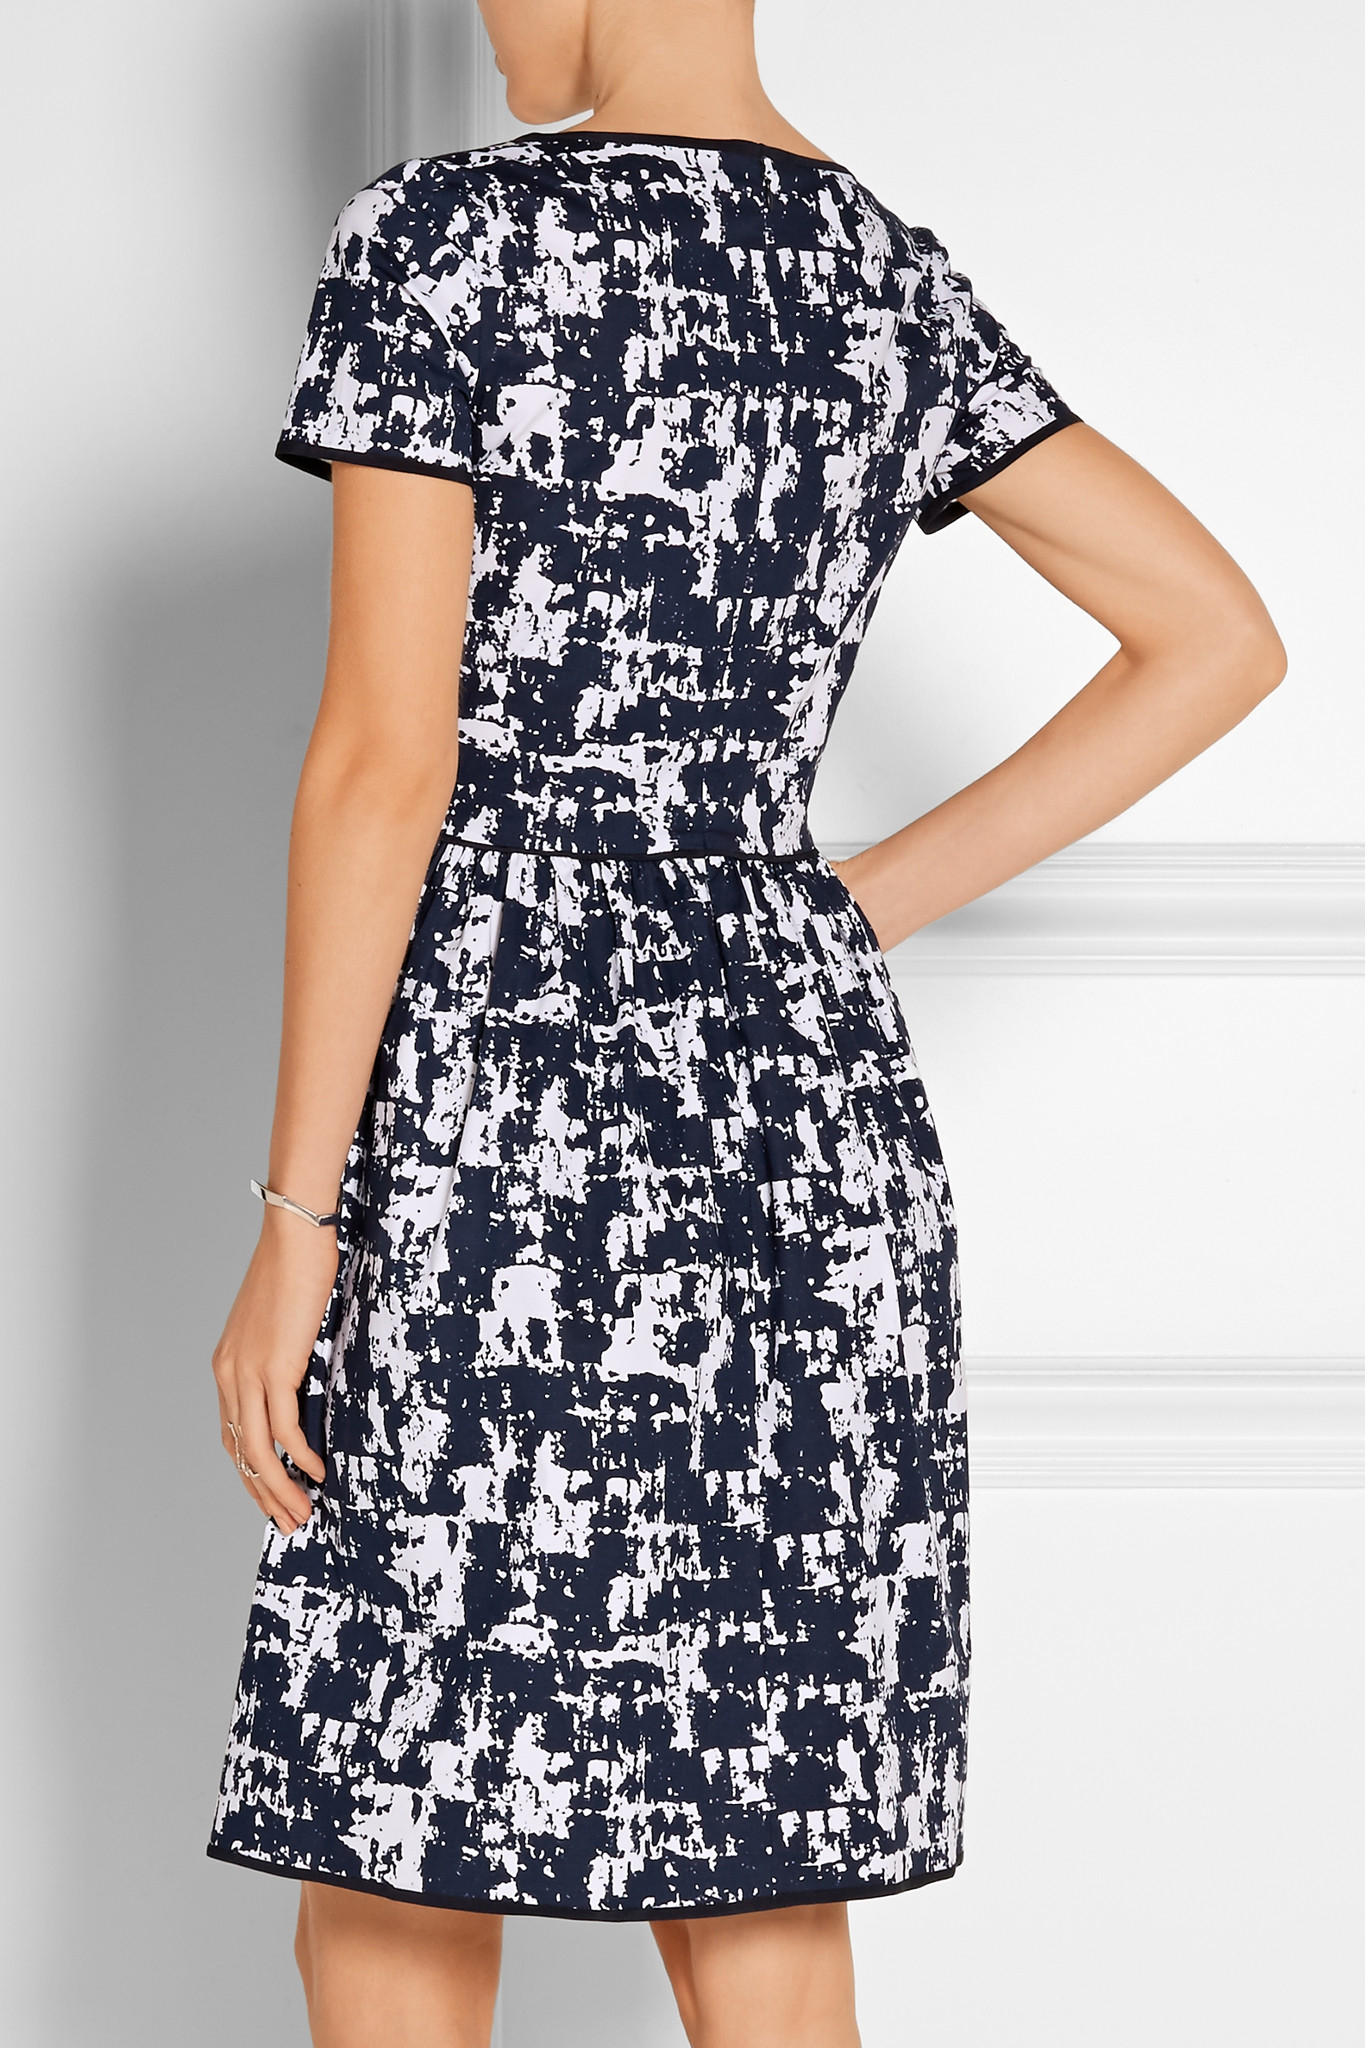 Pleated Printed Stretch-cotton Dress - Navy Oscar De La Renta Q7DbO2